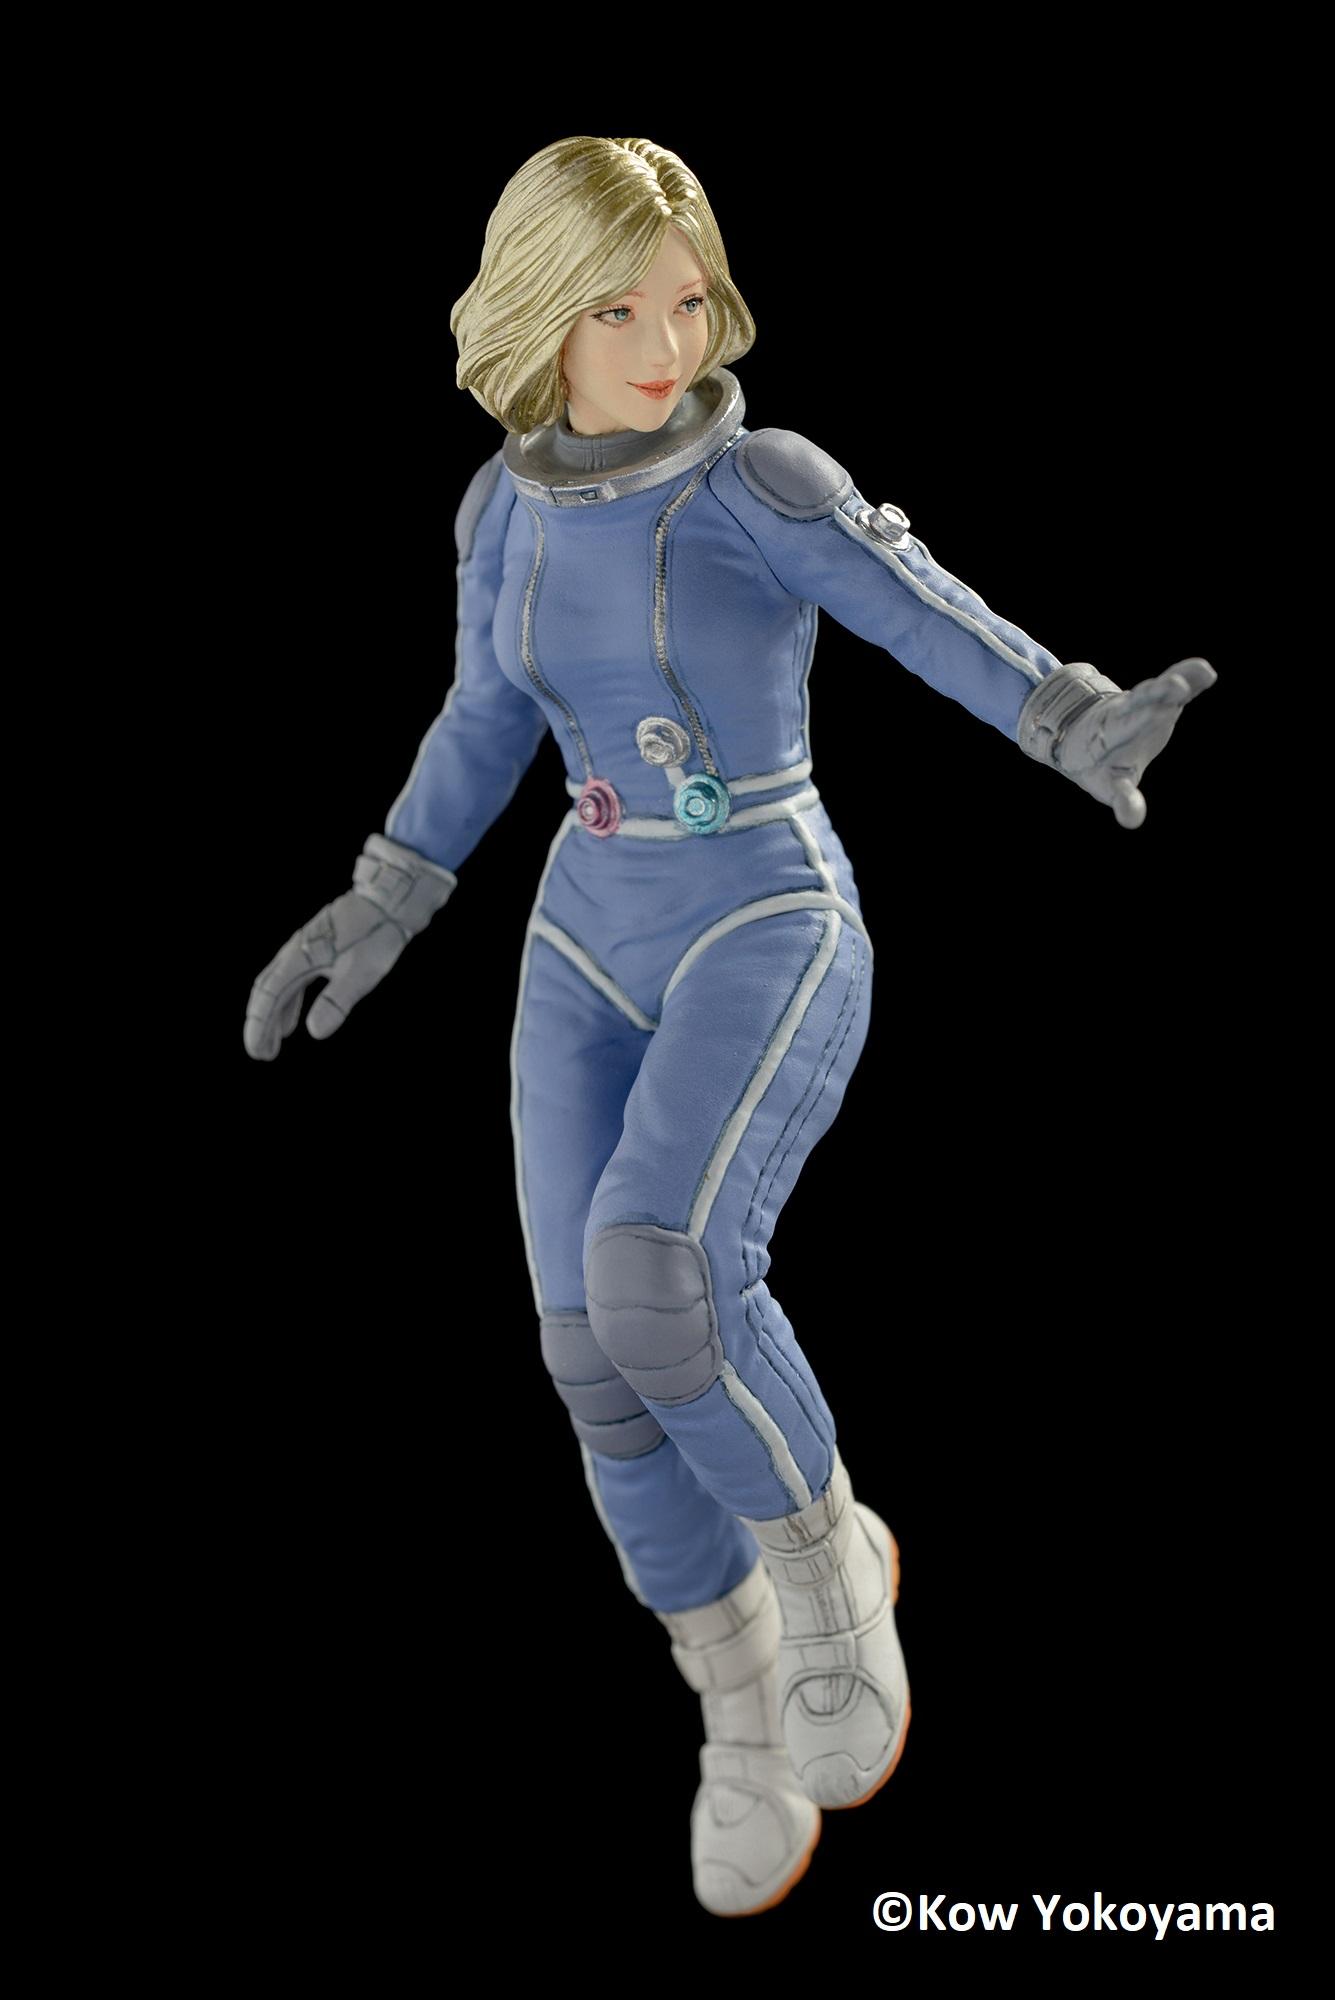 Brick Works Maschinen Krieger Mercenary Army Female Space Pilot (B) -  Floating in Low Gravity / Aerobic Environment